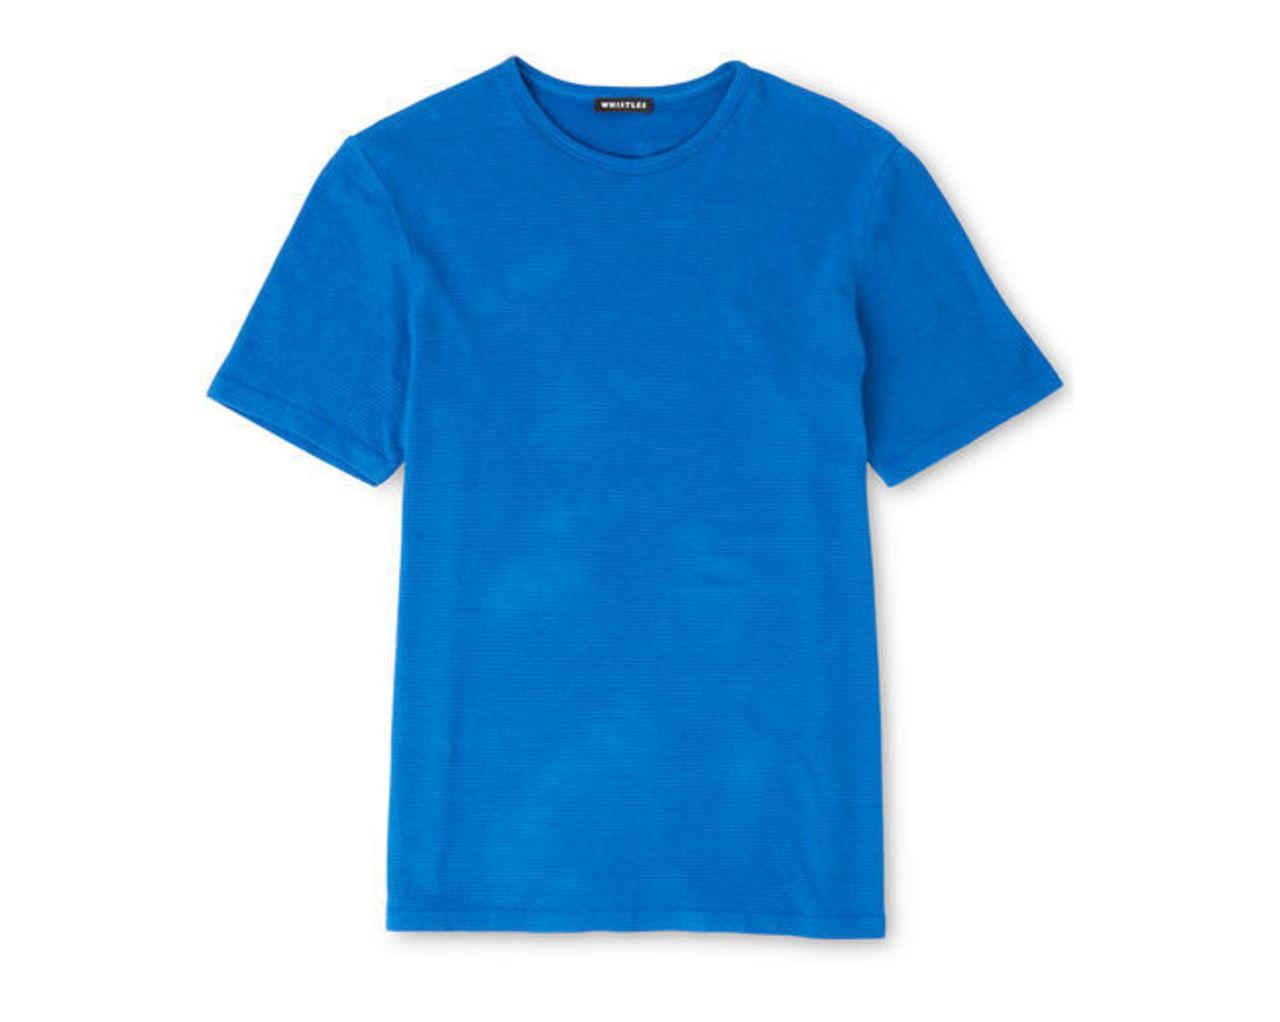 Overdyed Textured T-Shirt